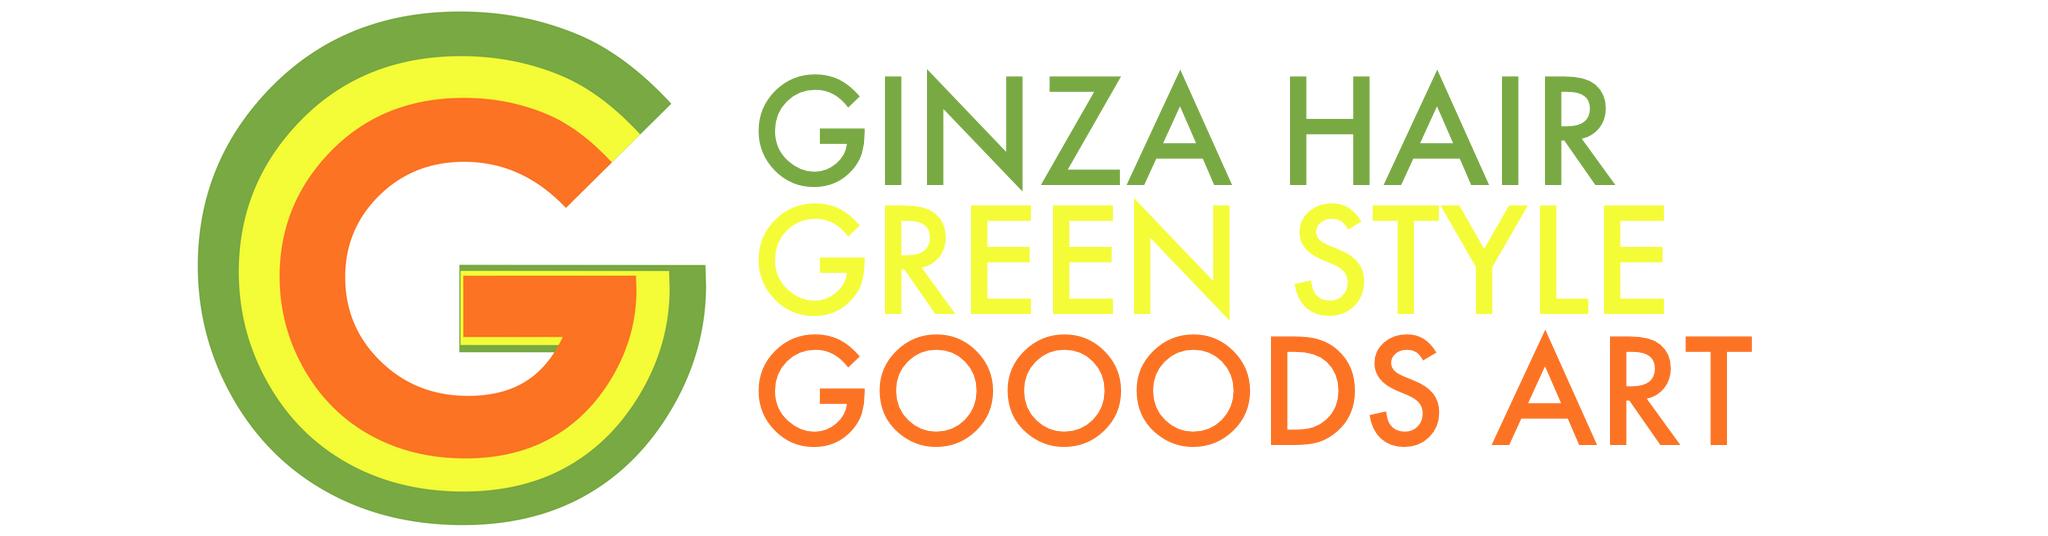 ginzahair/goodsart/